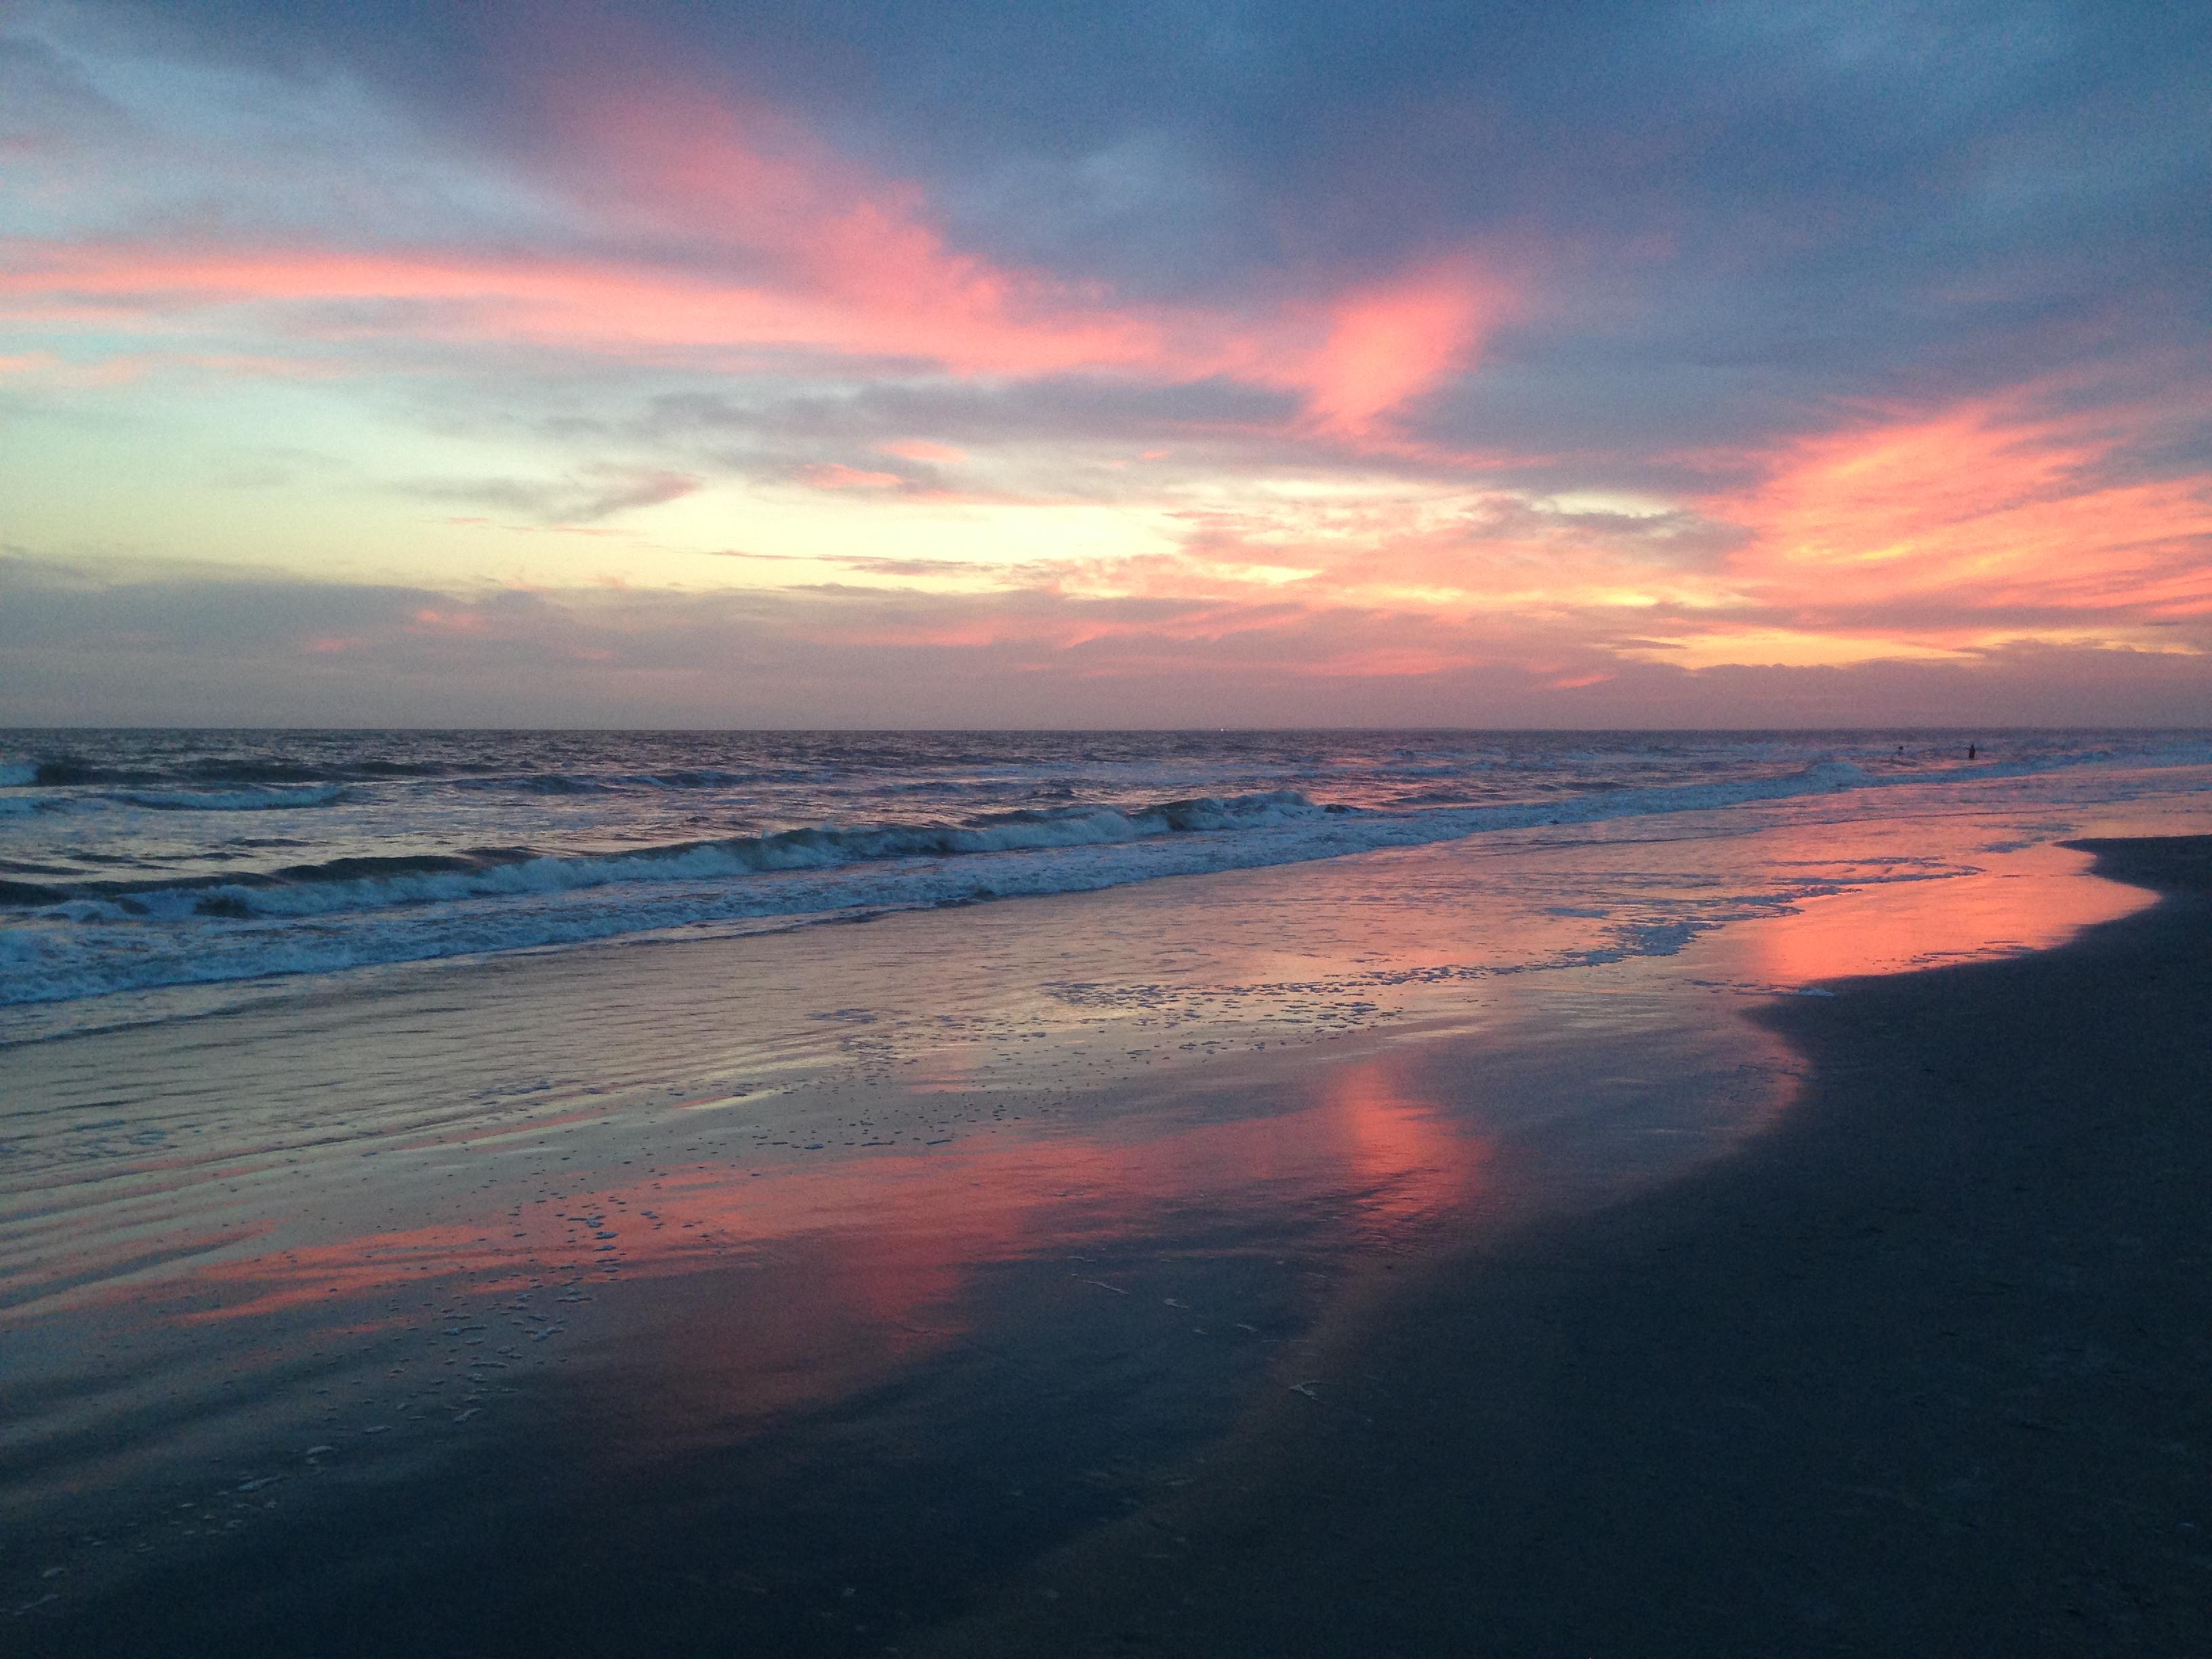 Days 159-176: South Carolina